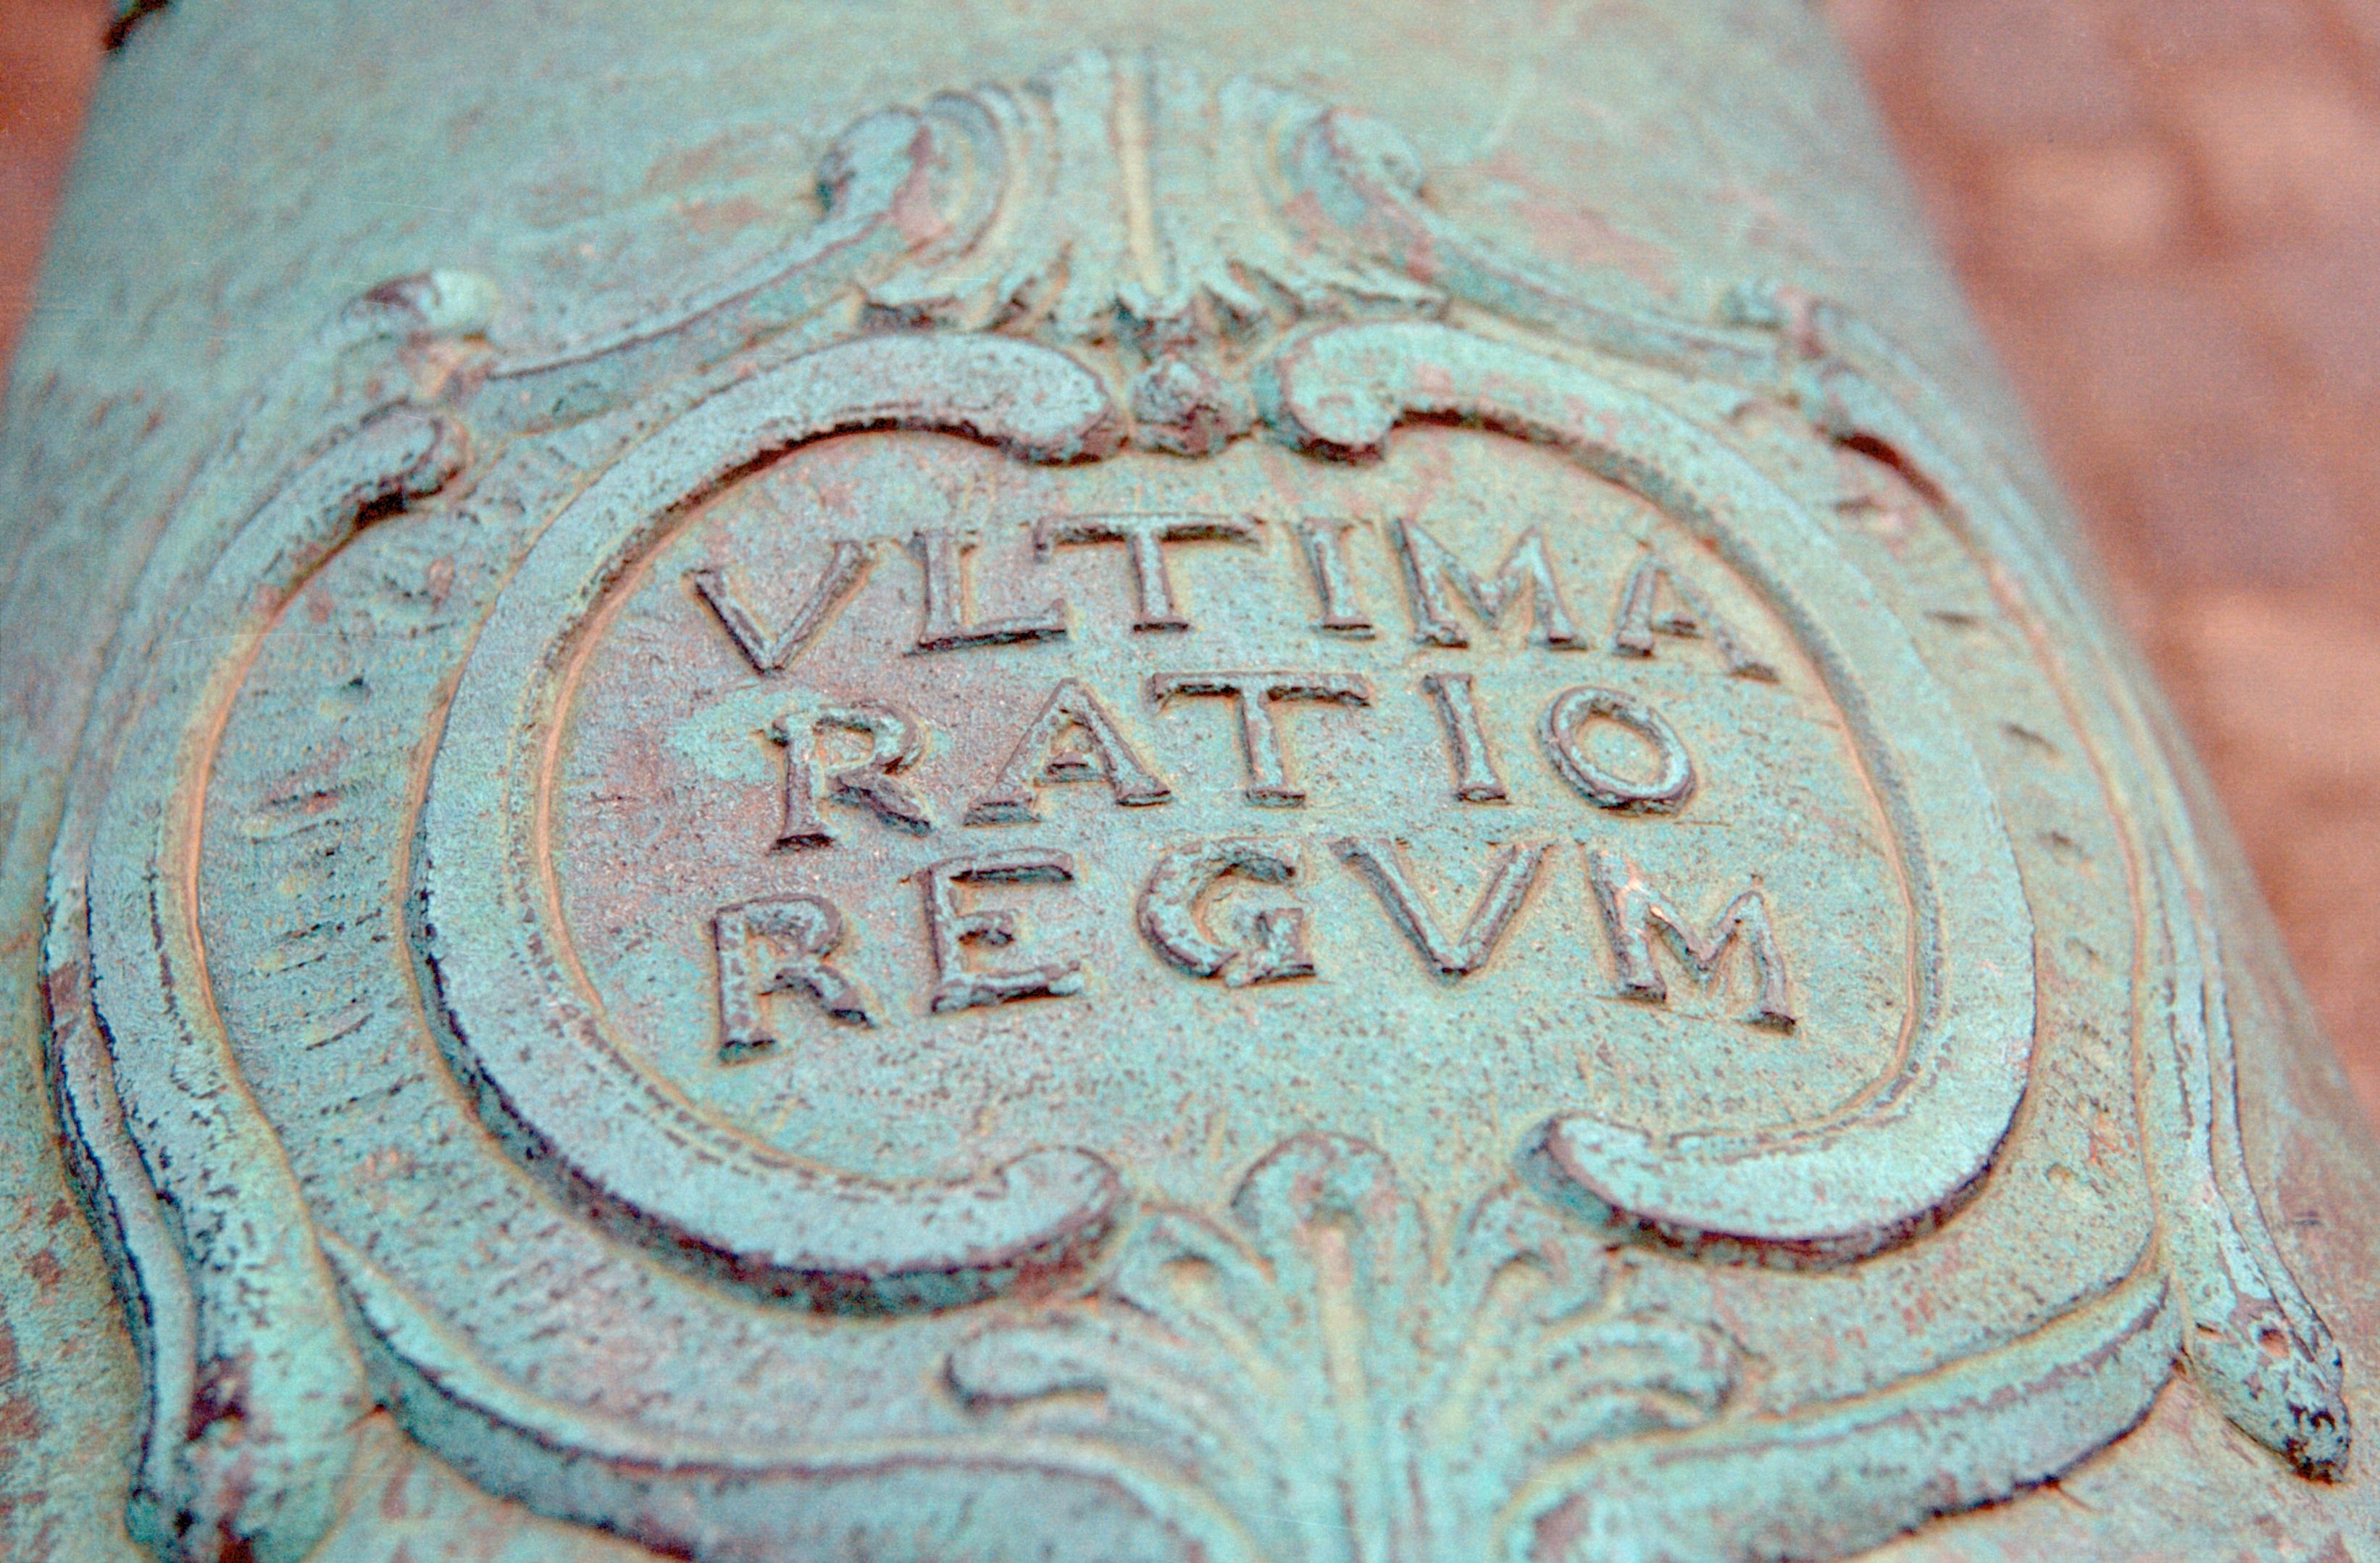 https://i1.wp.com/upload.wikimedia.org/wikipedia/commons/2/26/Ultima_Ratio_Regum_Cannon.jpg